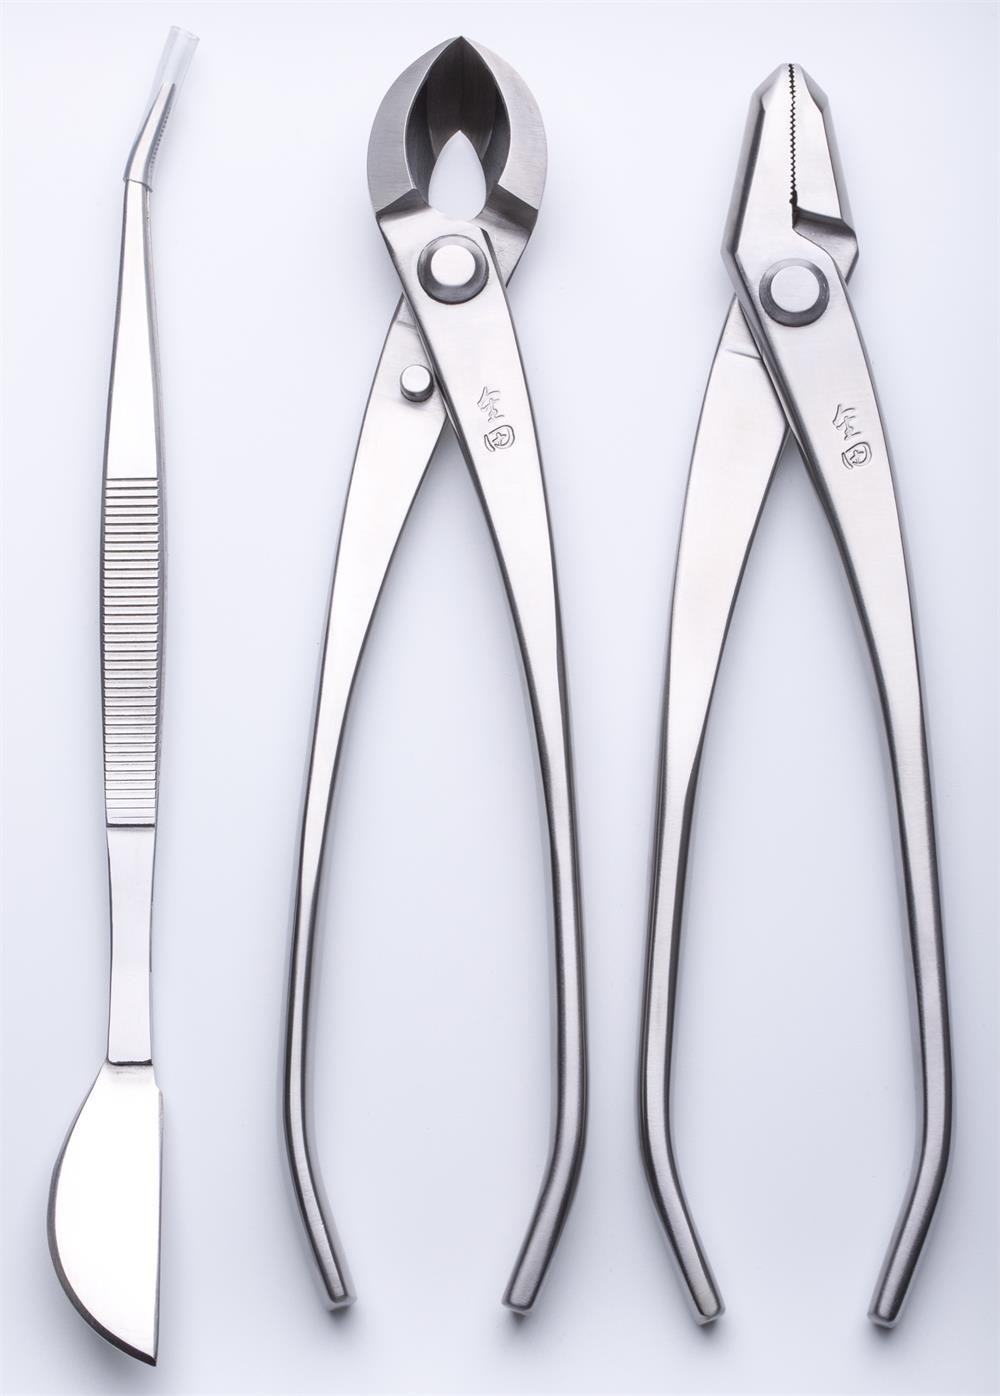 3 PCS Bonsai tool Set JTTK-20 Jin Pliers / Round Edge Cutter / Bonsai Tweezers Master Grade Bonsai Tools Excellent Quailty